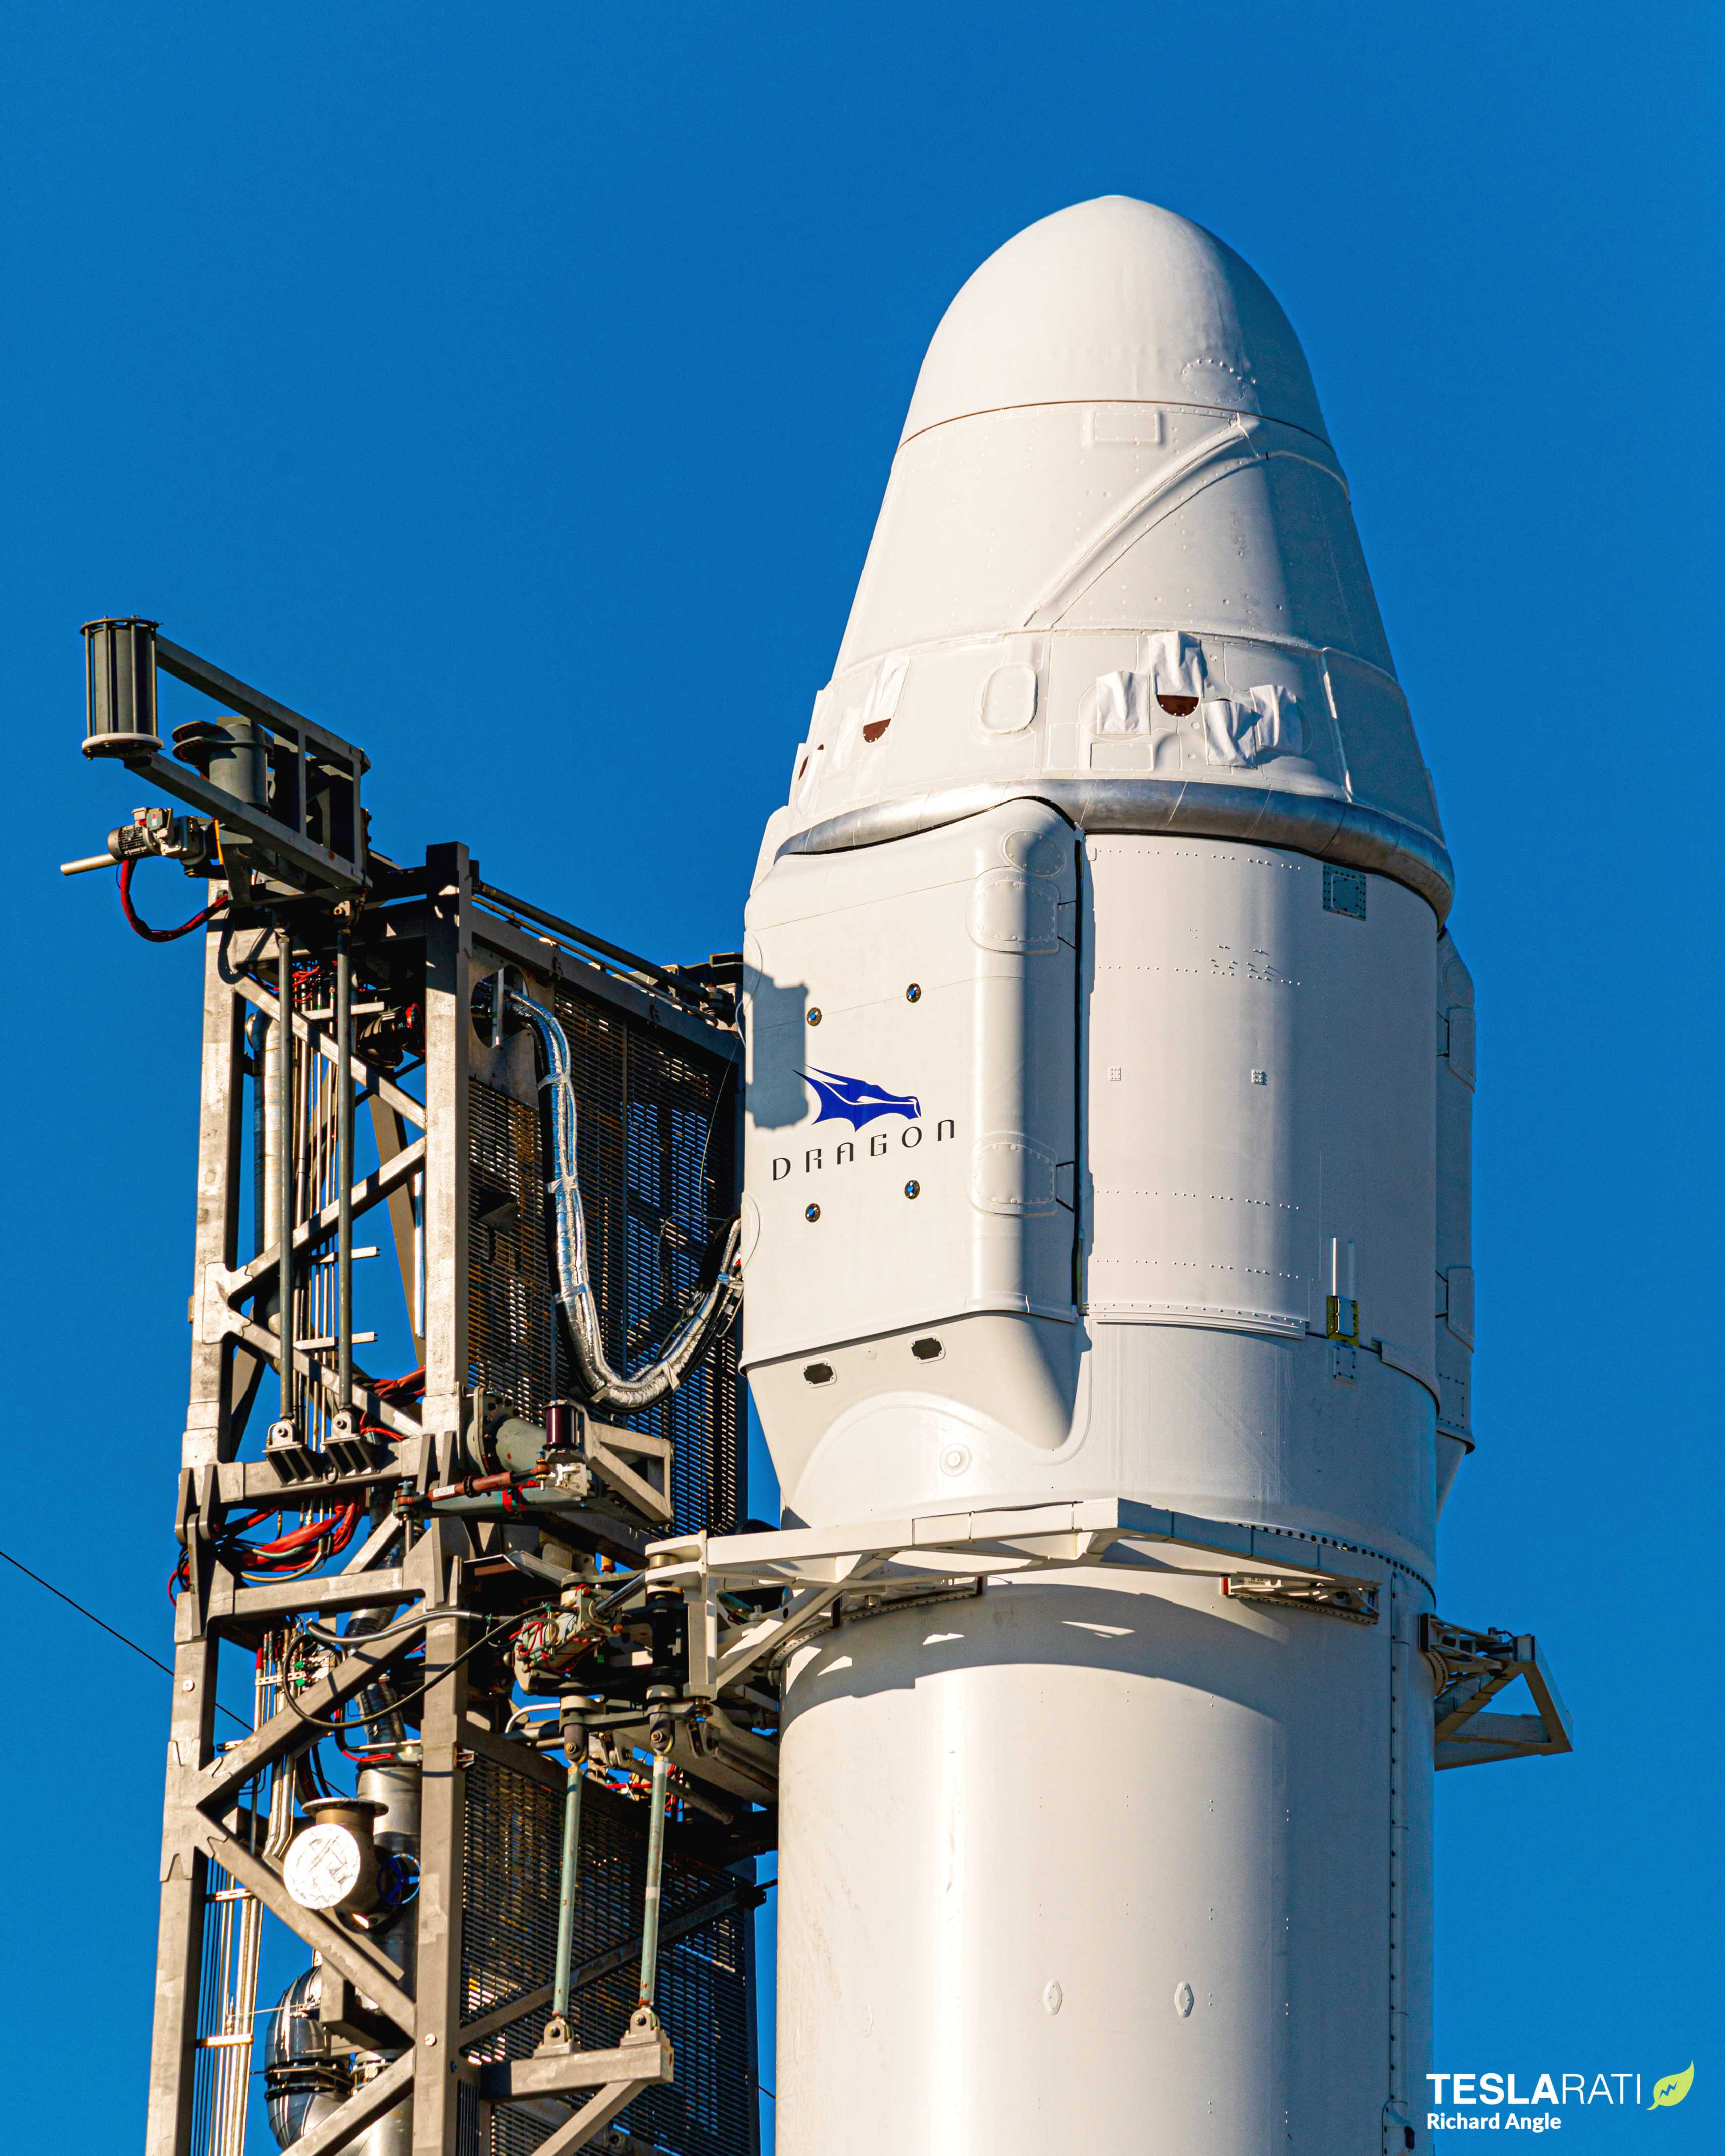 CRS-19 C106 Falcon 9 B1059 vertical LC-40 120419 (Richard Angle) (5) (c)